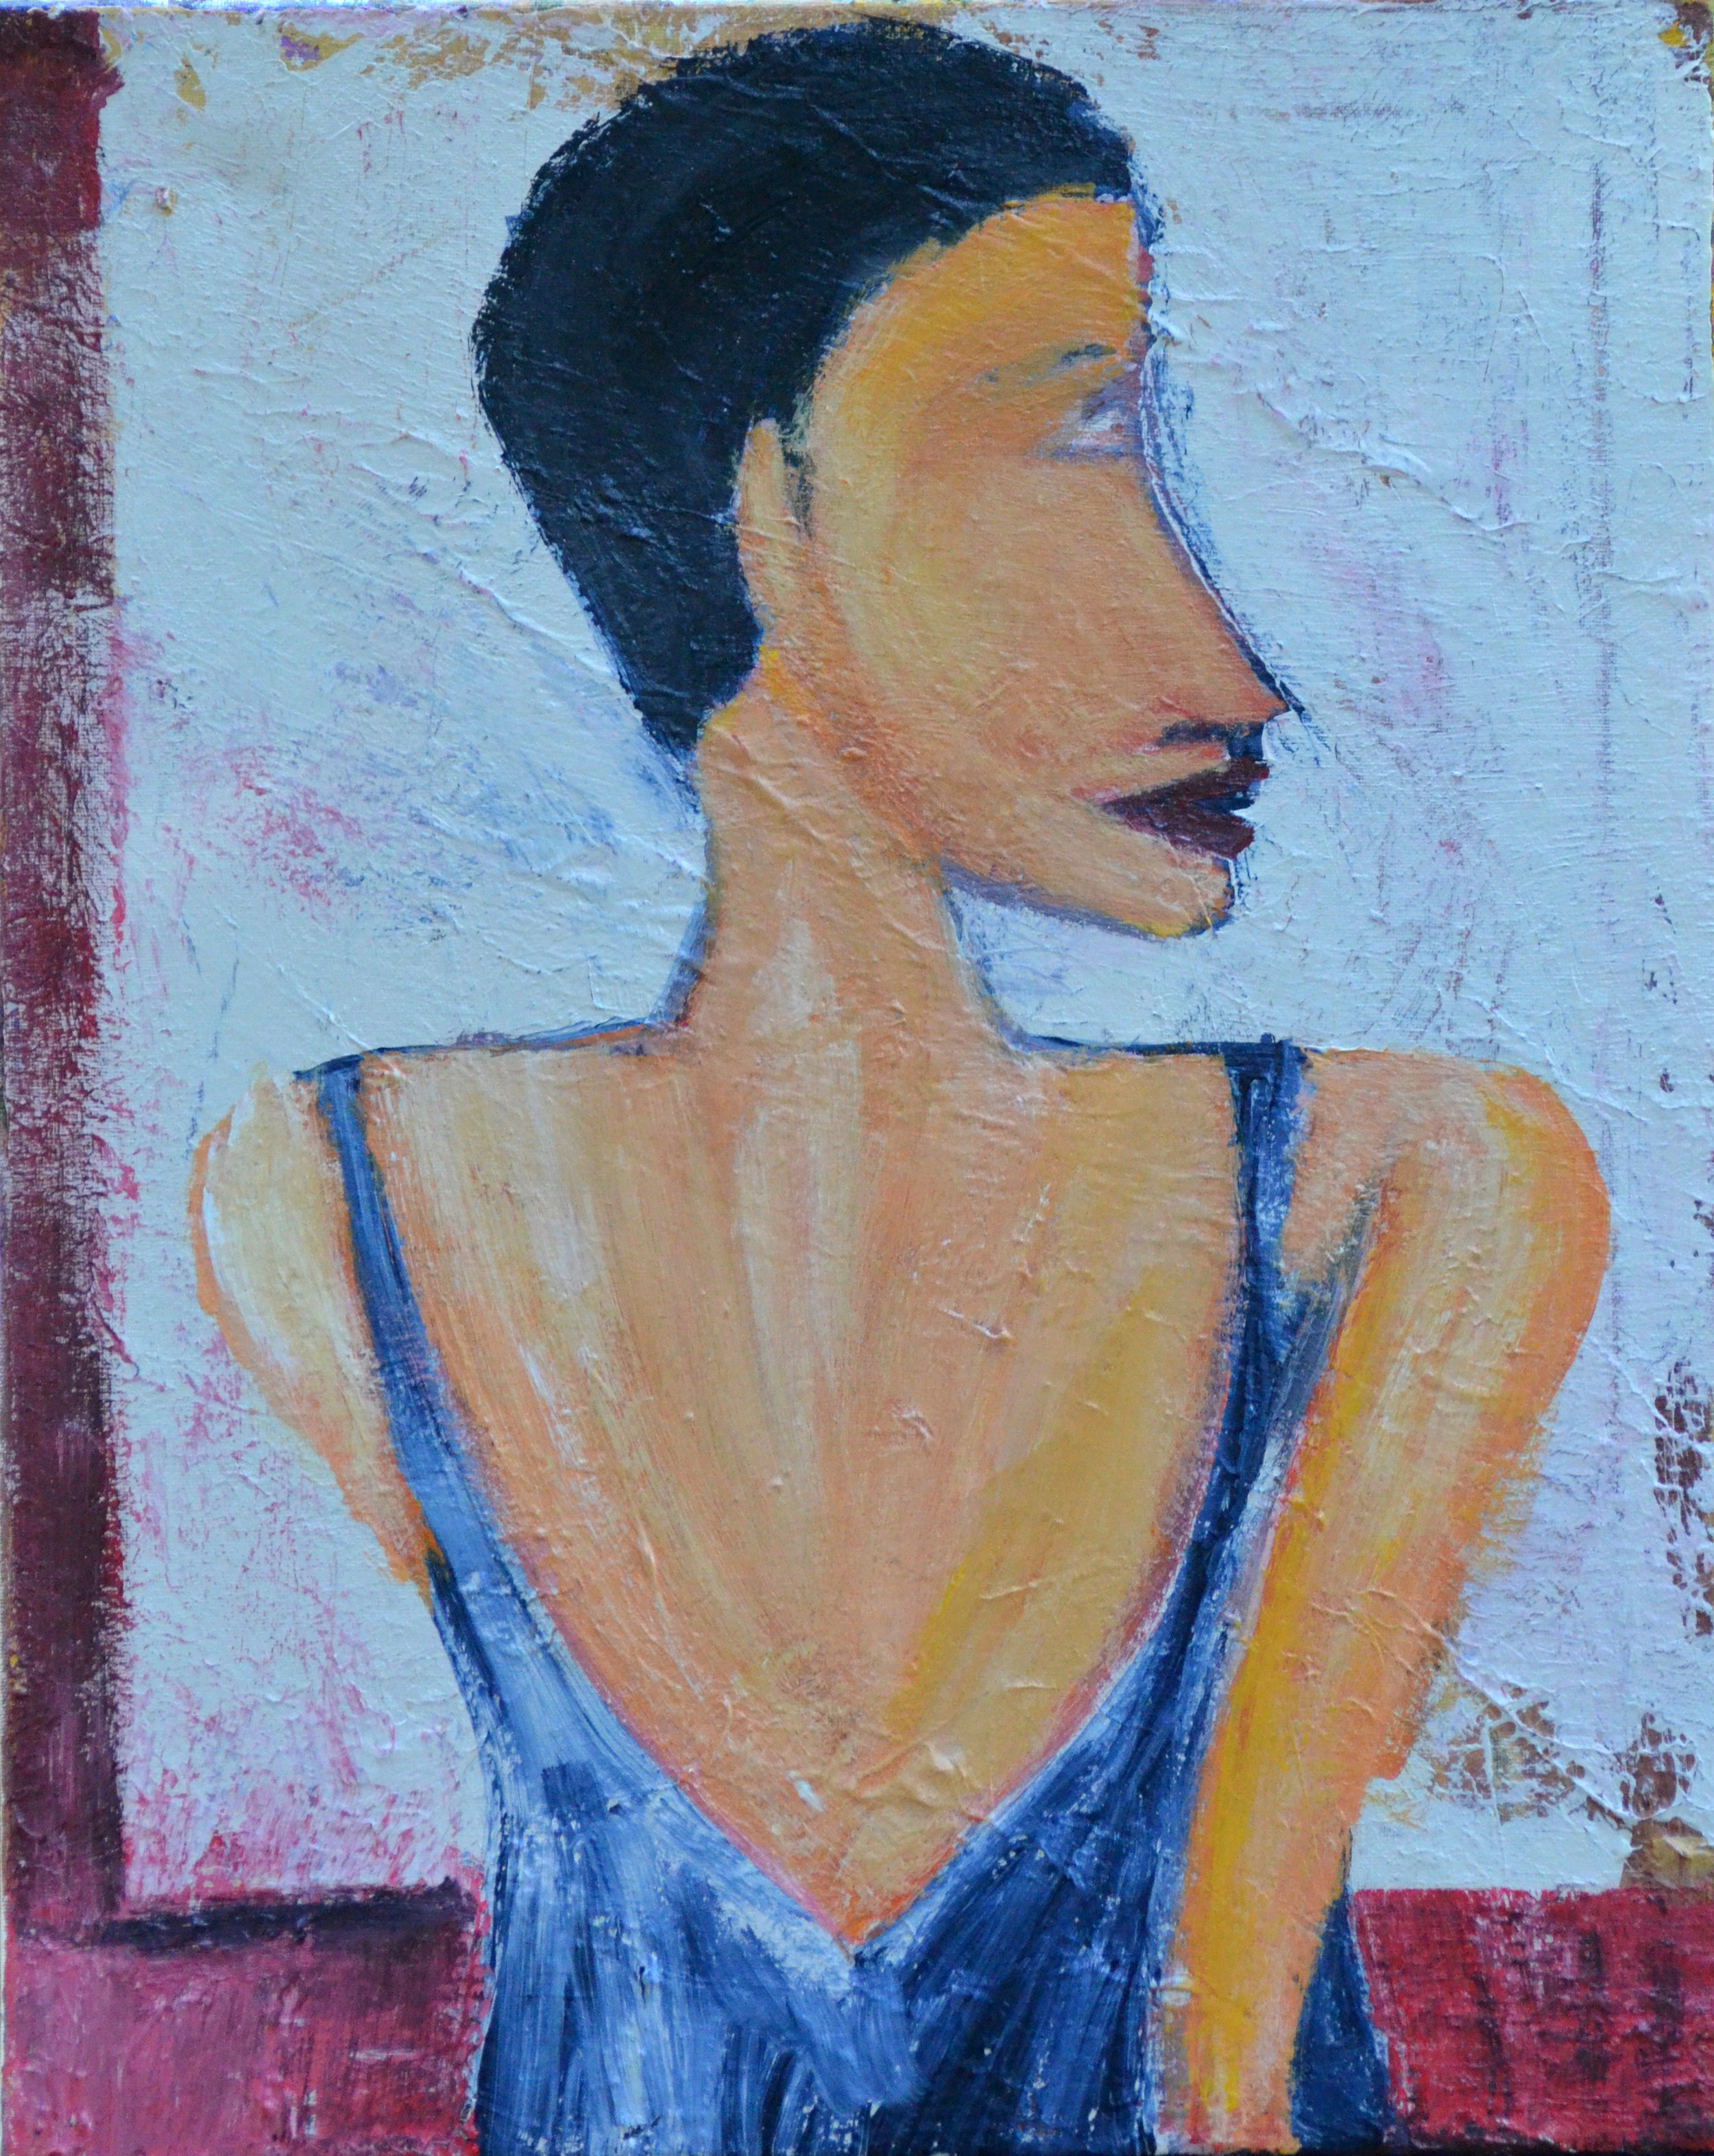 Woman in Blue Dress (2016, acrylic, 16 by 20)